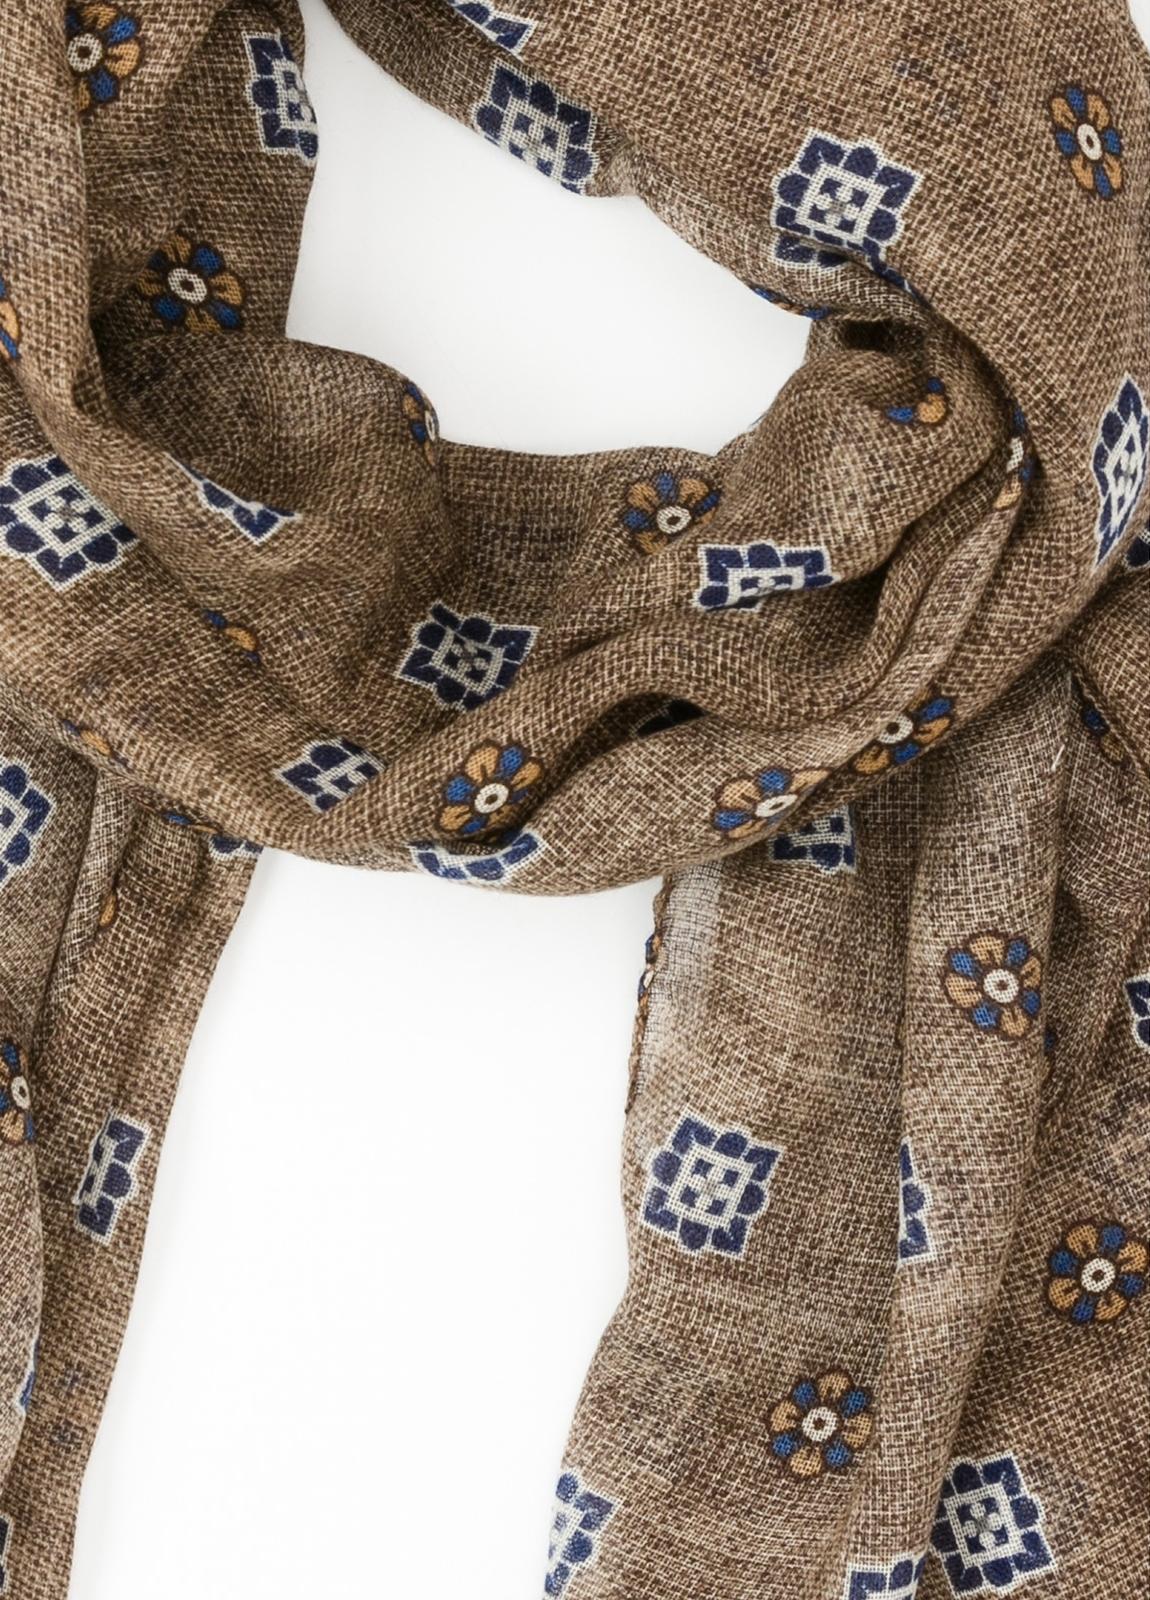 Foulard estampado floral color tostado, 70 x 200 cm. 100% Lana. - Ítem1